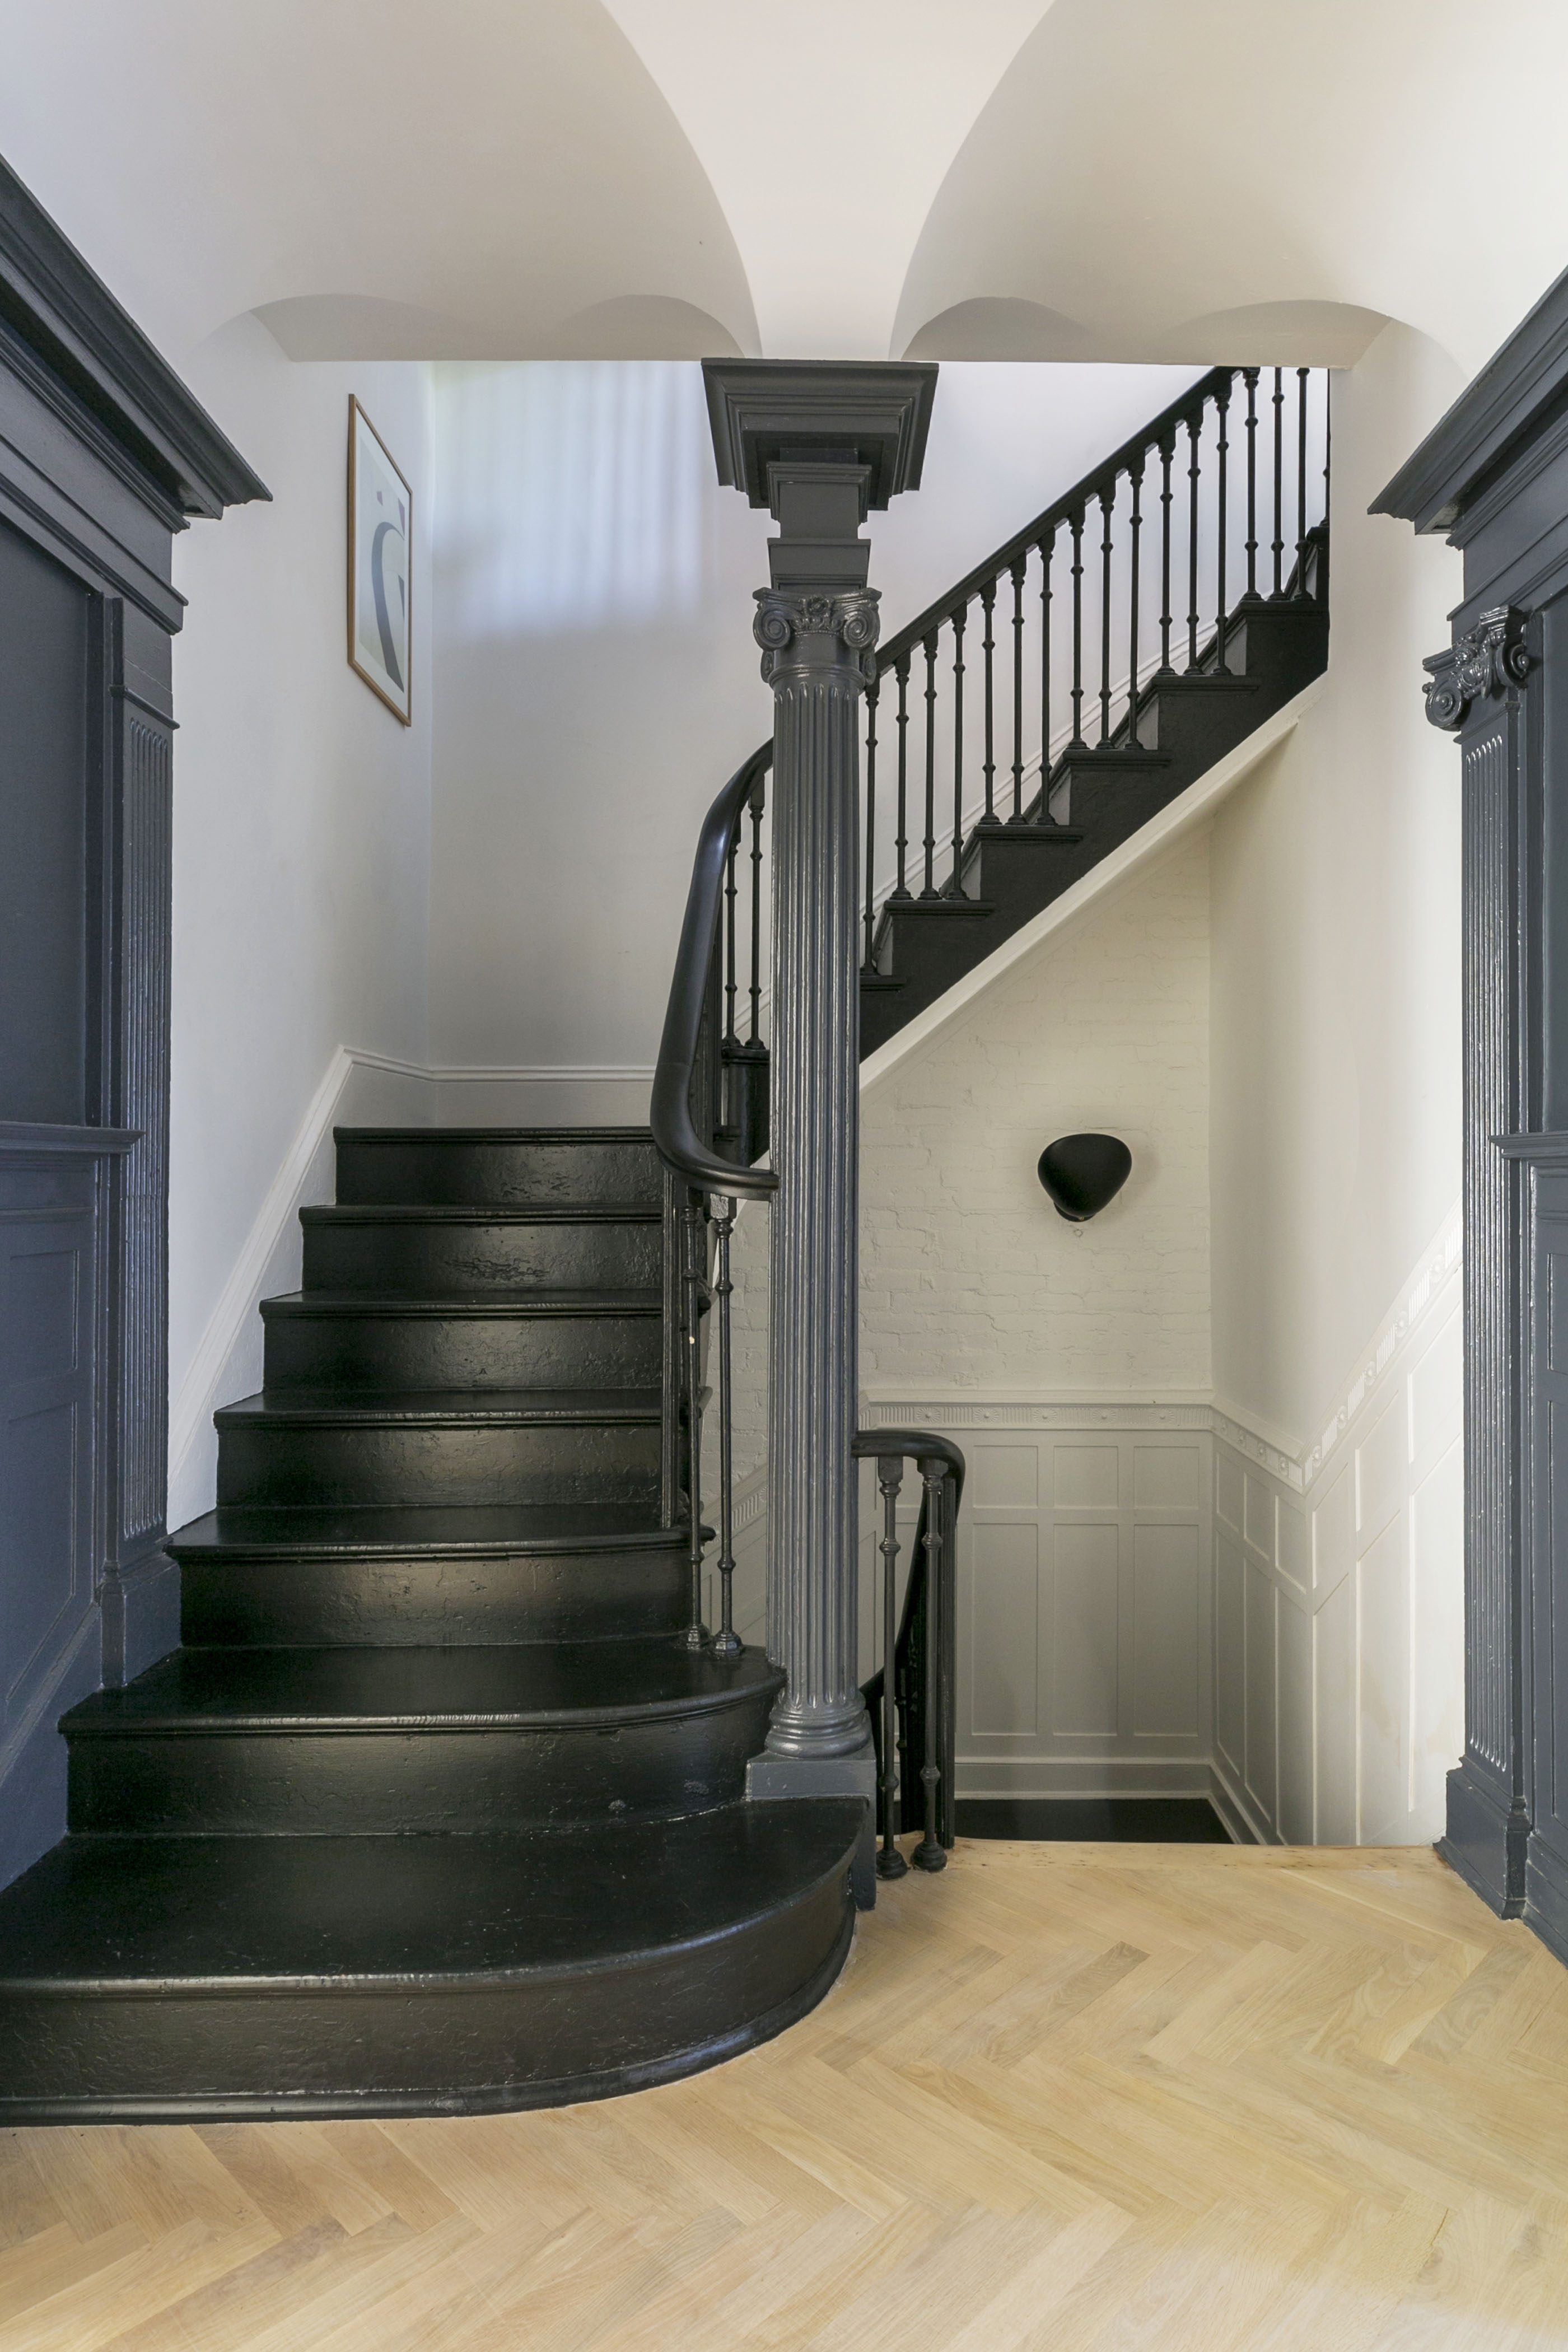 renovation diary, mysqft, clinton hill, renovation, interiors, design, urban pioneering, alex scott porter, brooklyn brownstone, townhouse, renovation